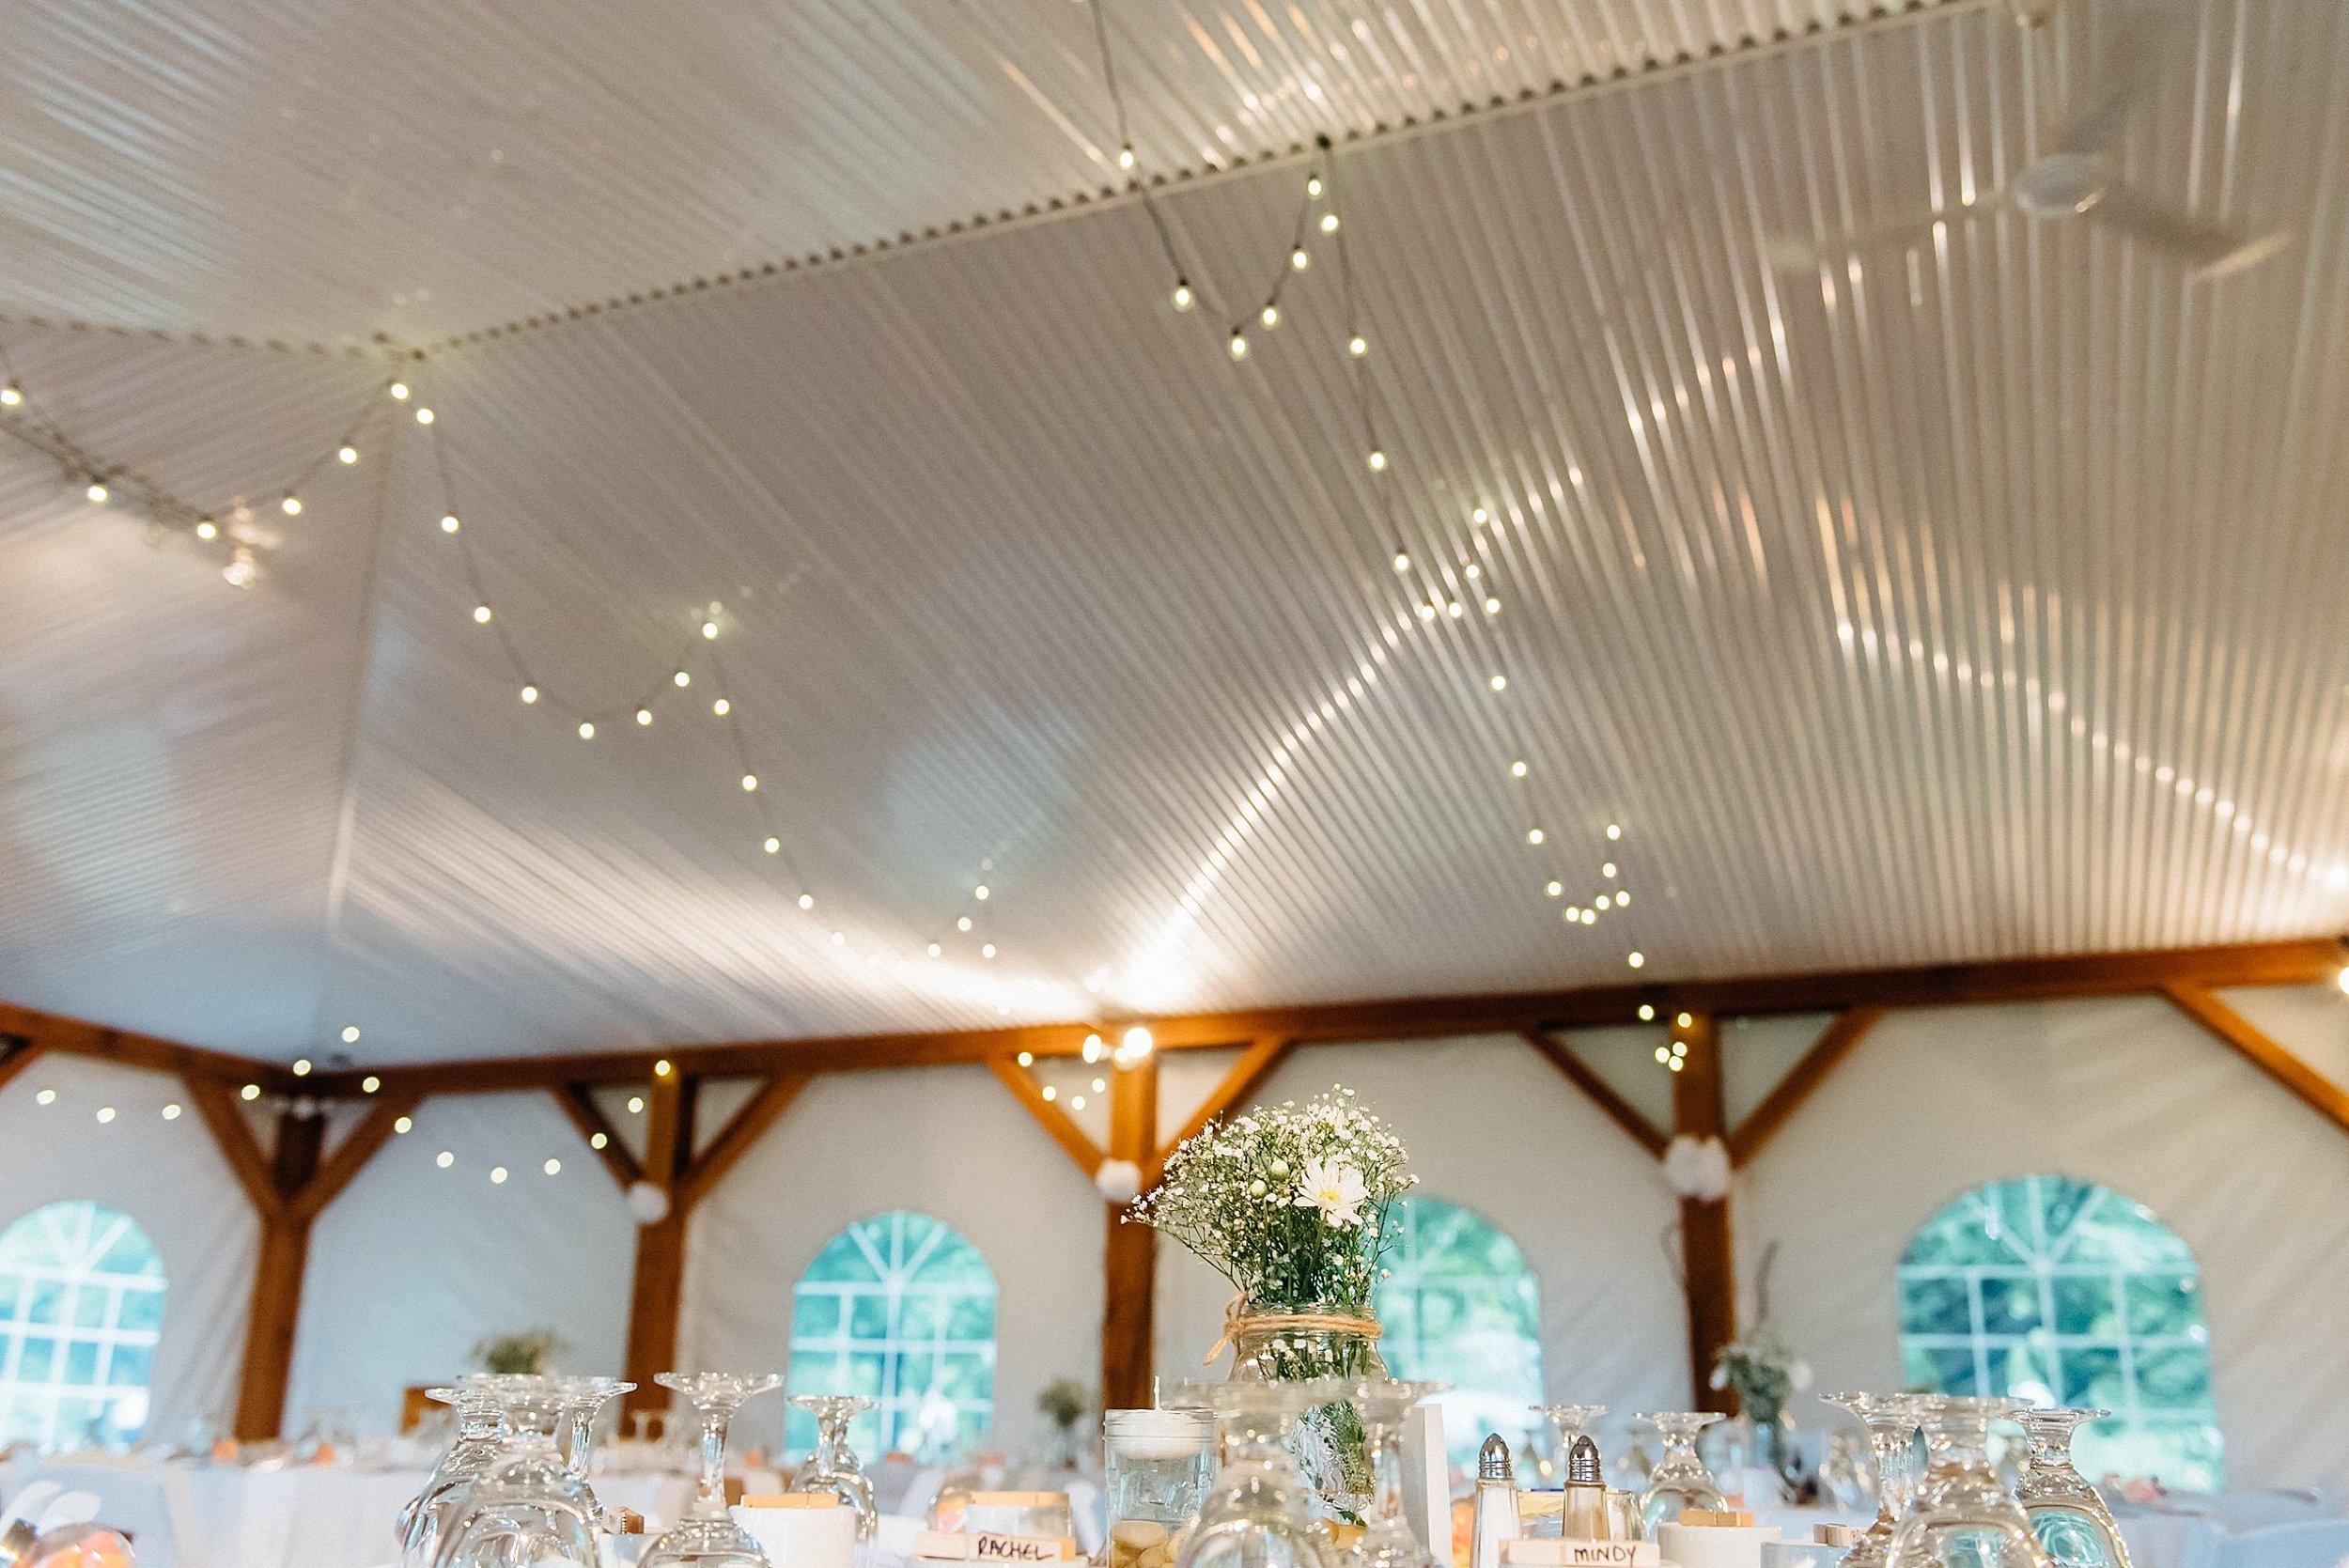 Ottawa Wedding Photographer - Stanley's Olde Maple Lane Barn Wedding - Ali & Batoul Photography_0008.jpg